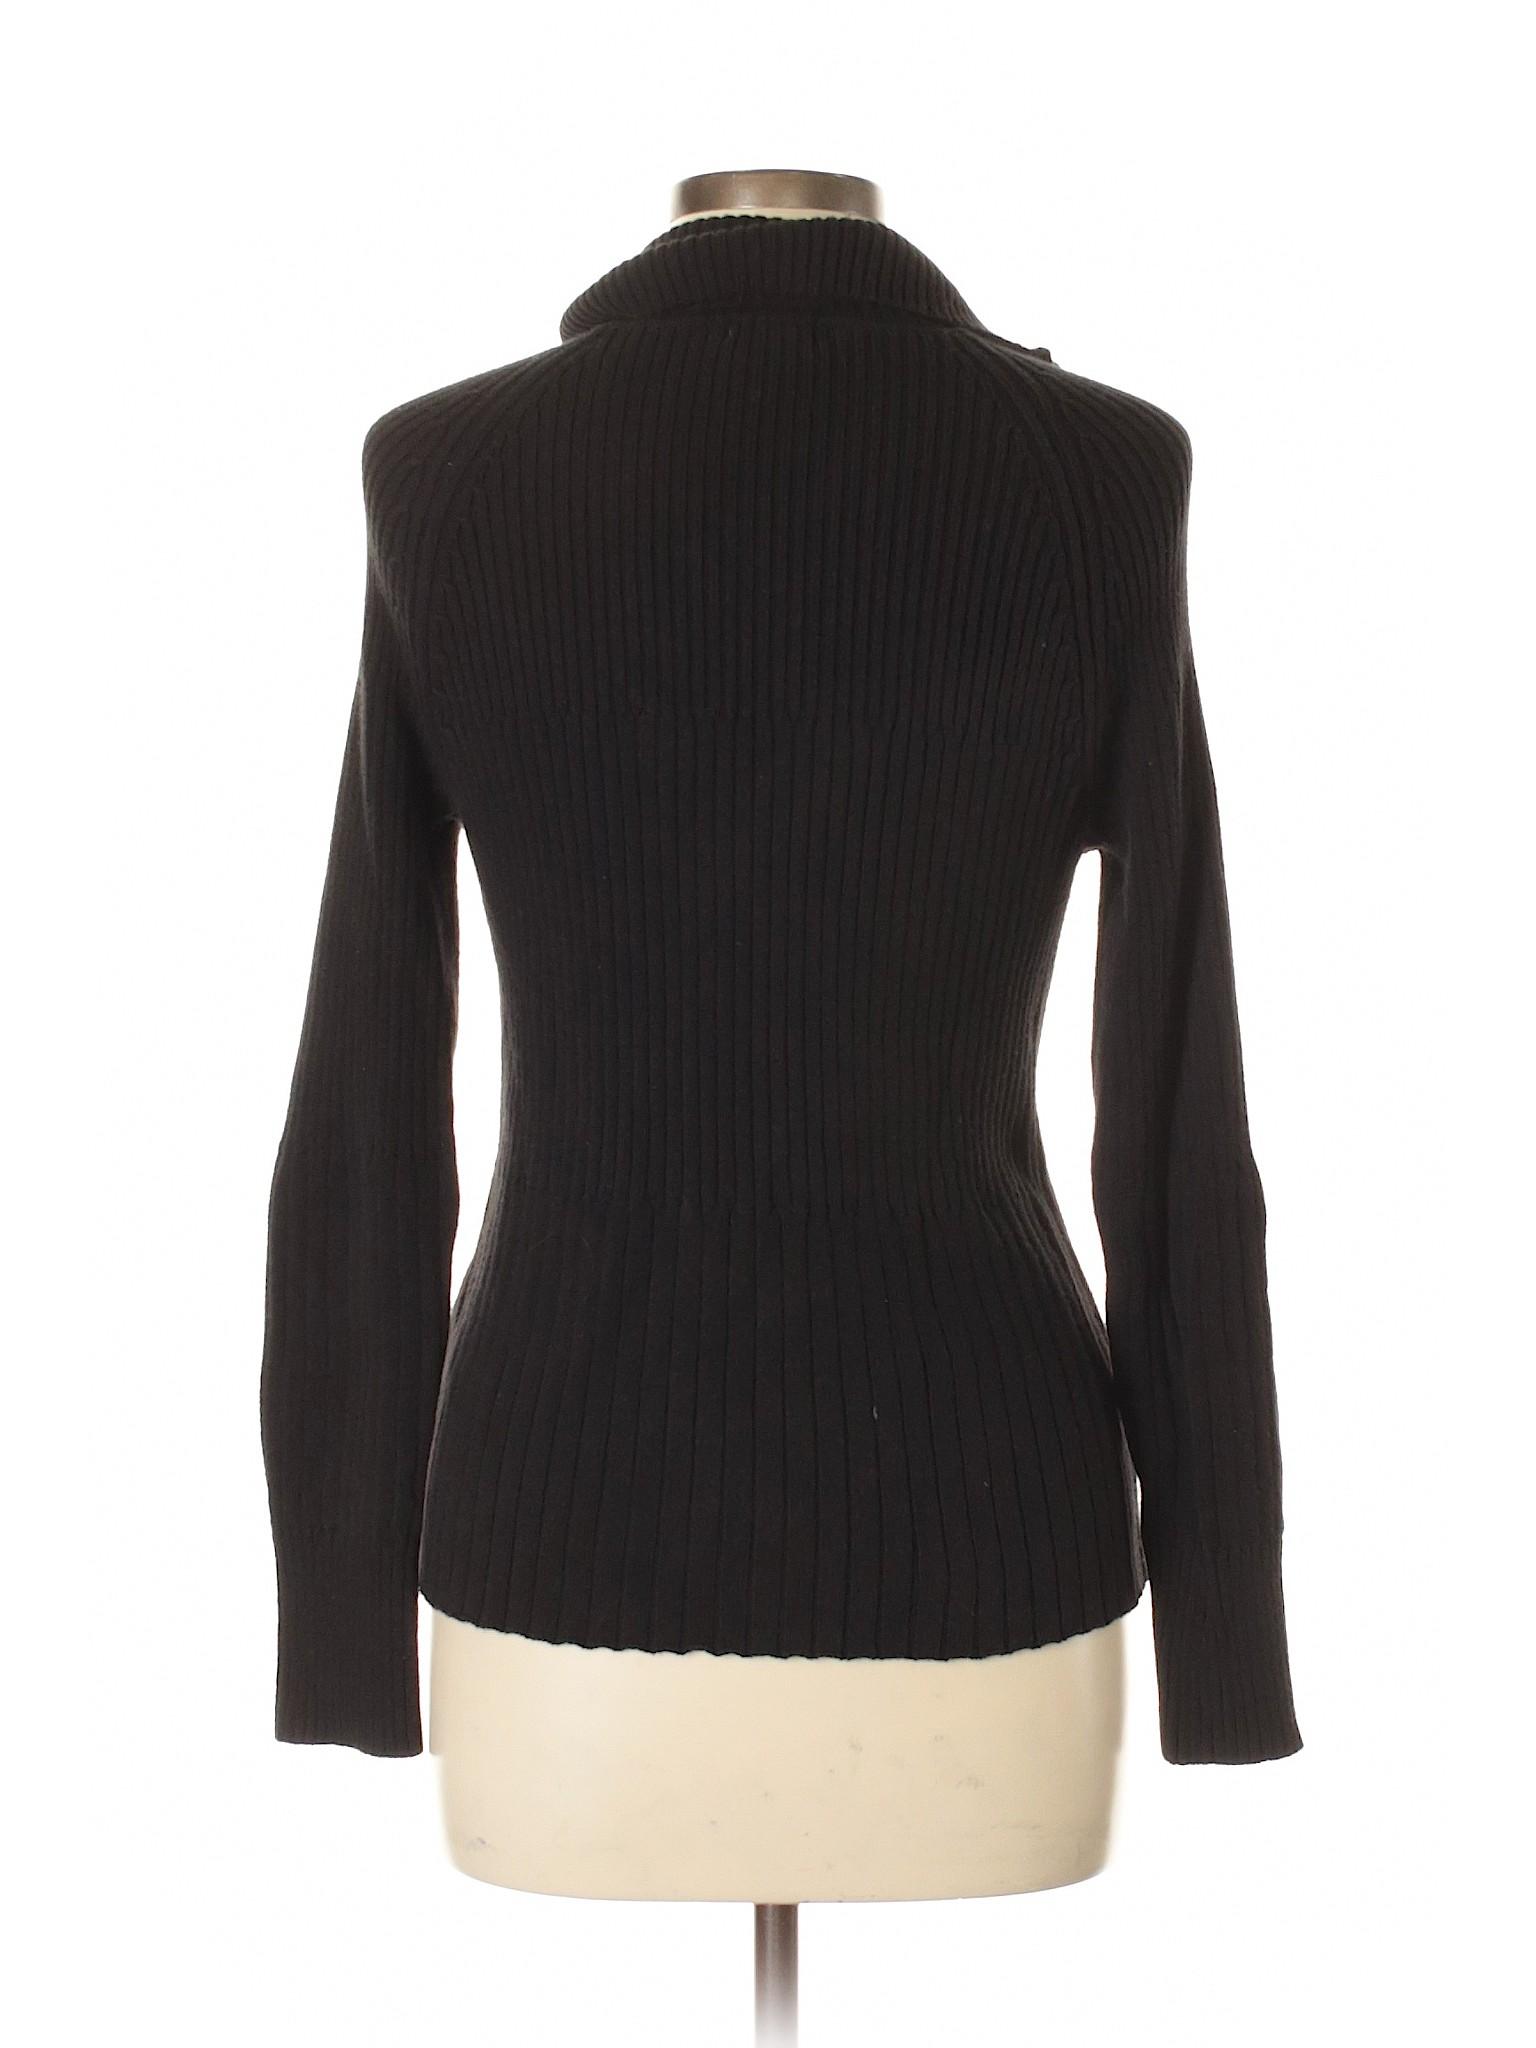 Evie winter Boutique winter Evie Cardigan Cardigan Boutique qagH0w